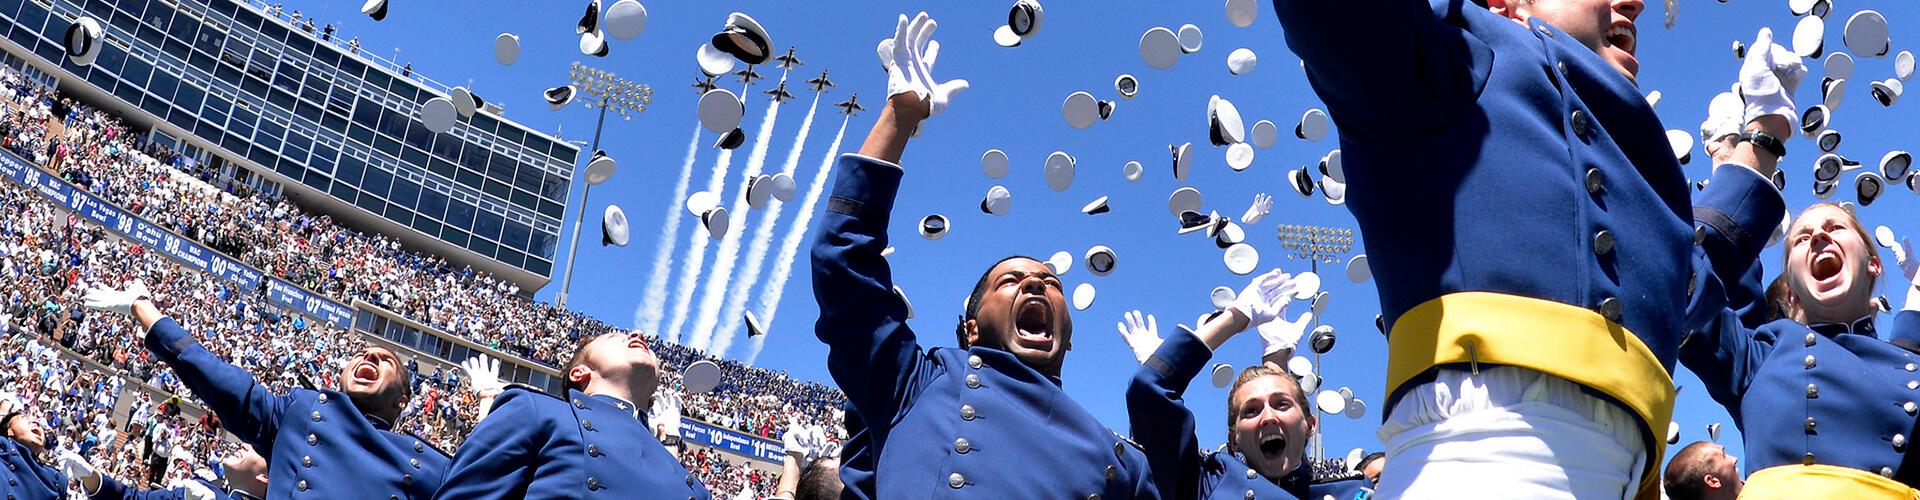 Usafa Graduation 2020.Graduation United States Air Force Academy